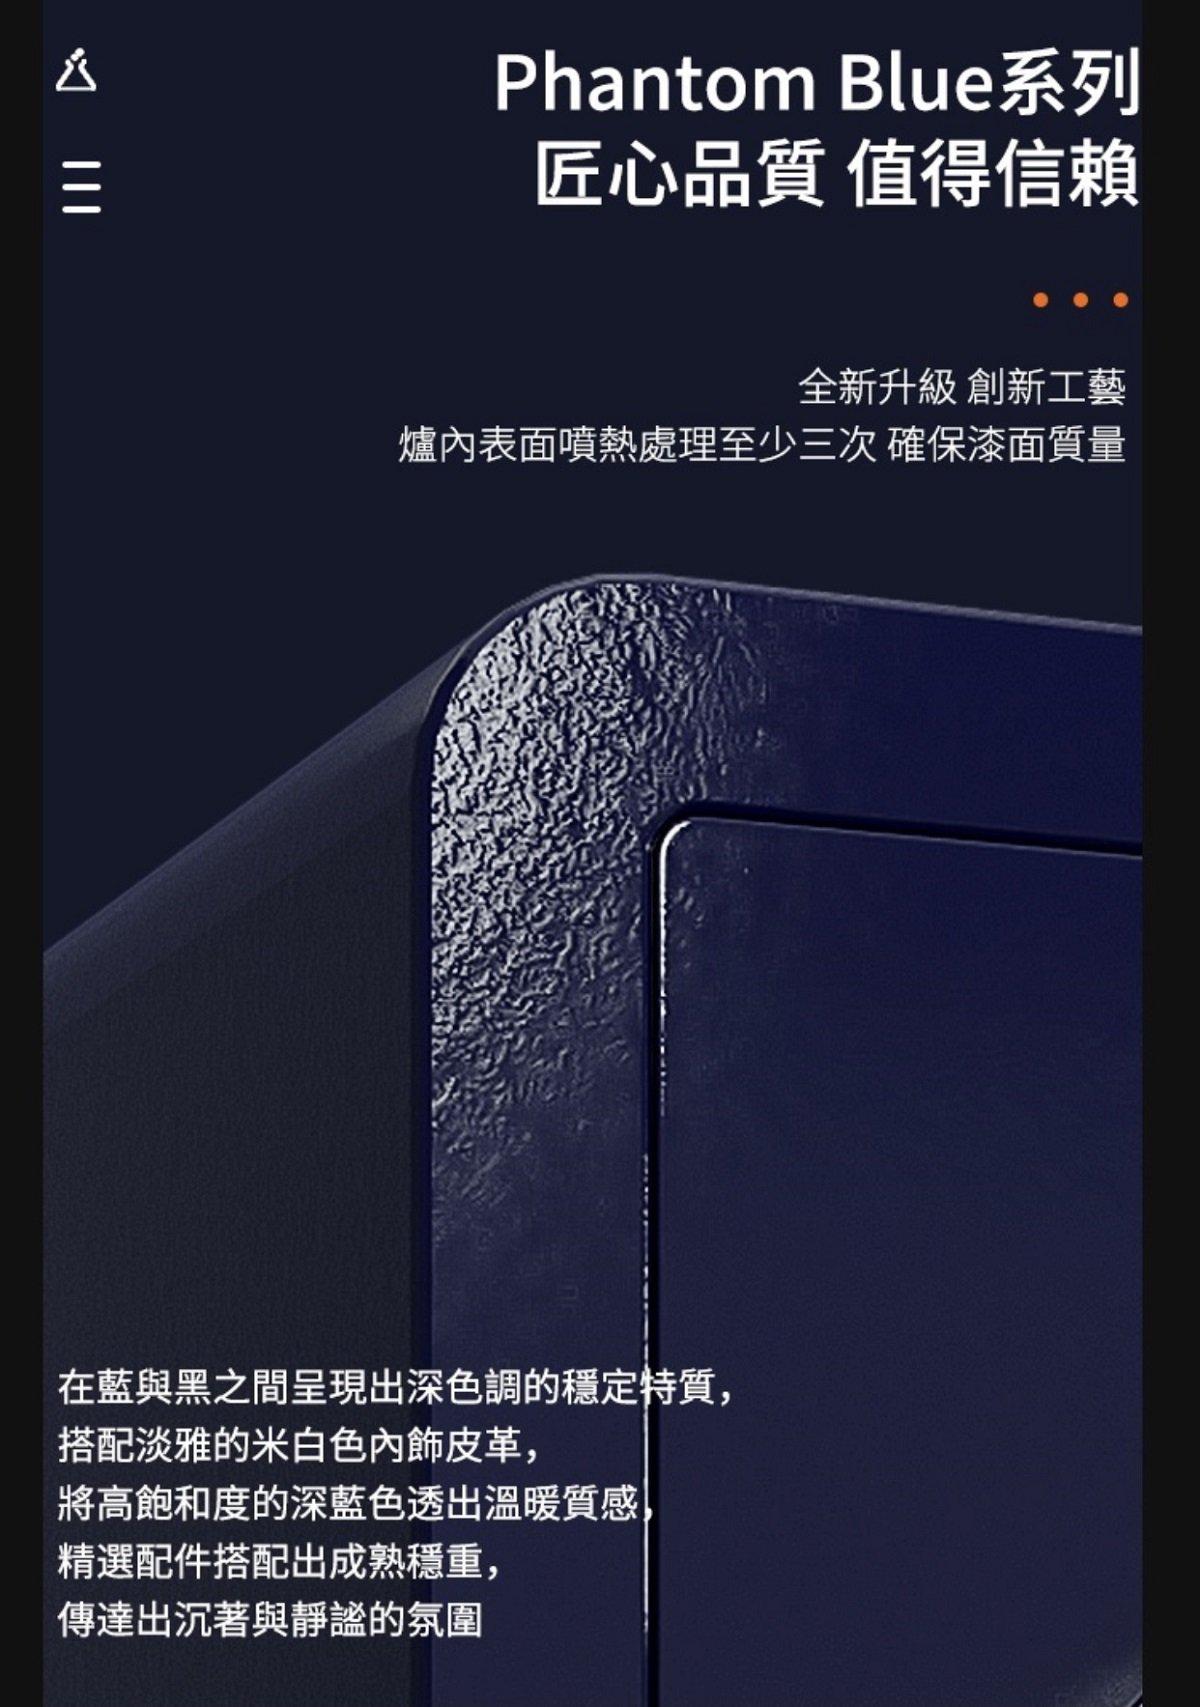 Marketing graphic-PB38-10